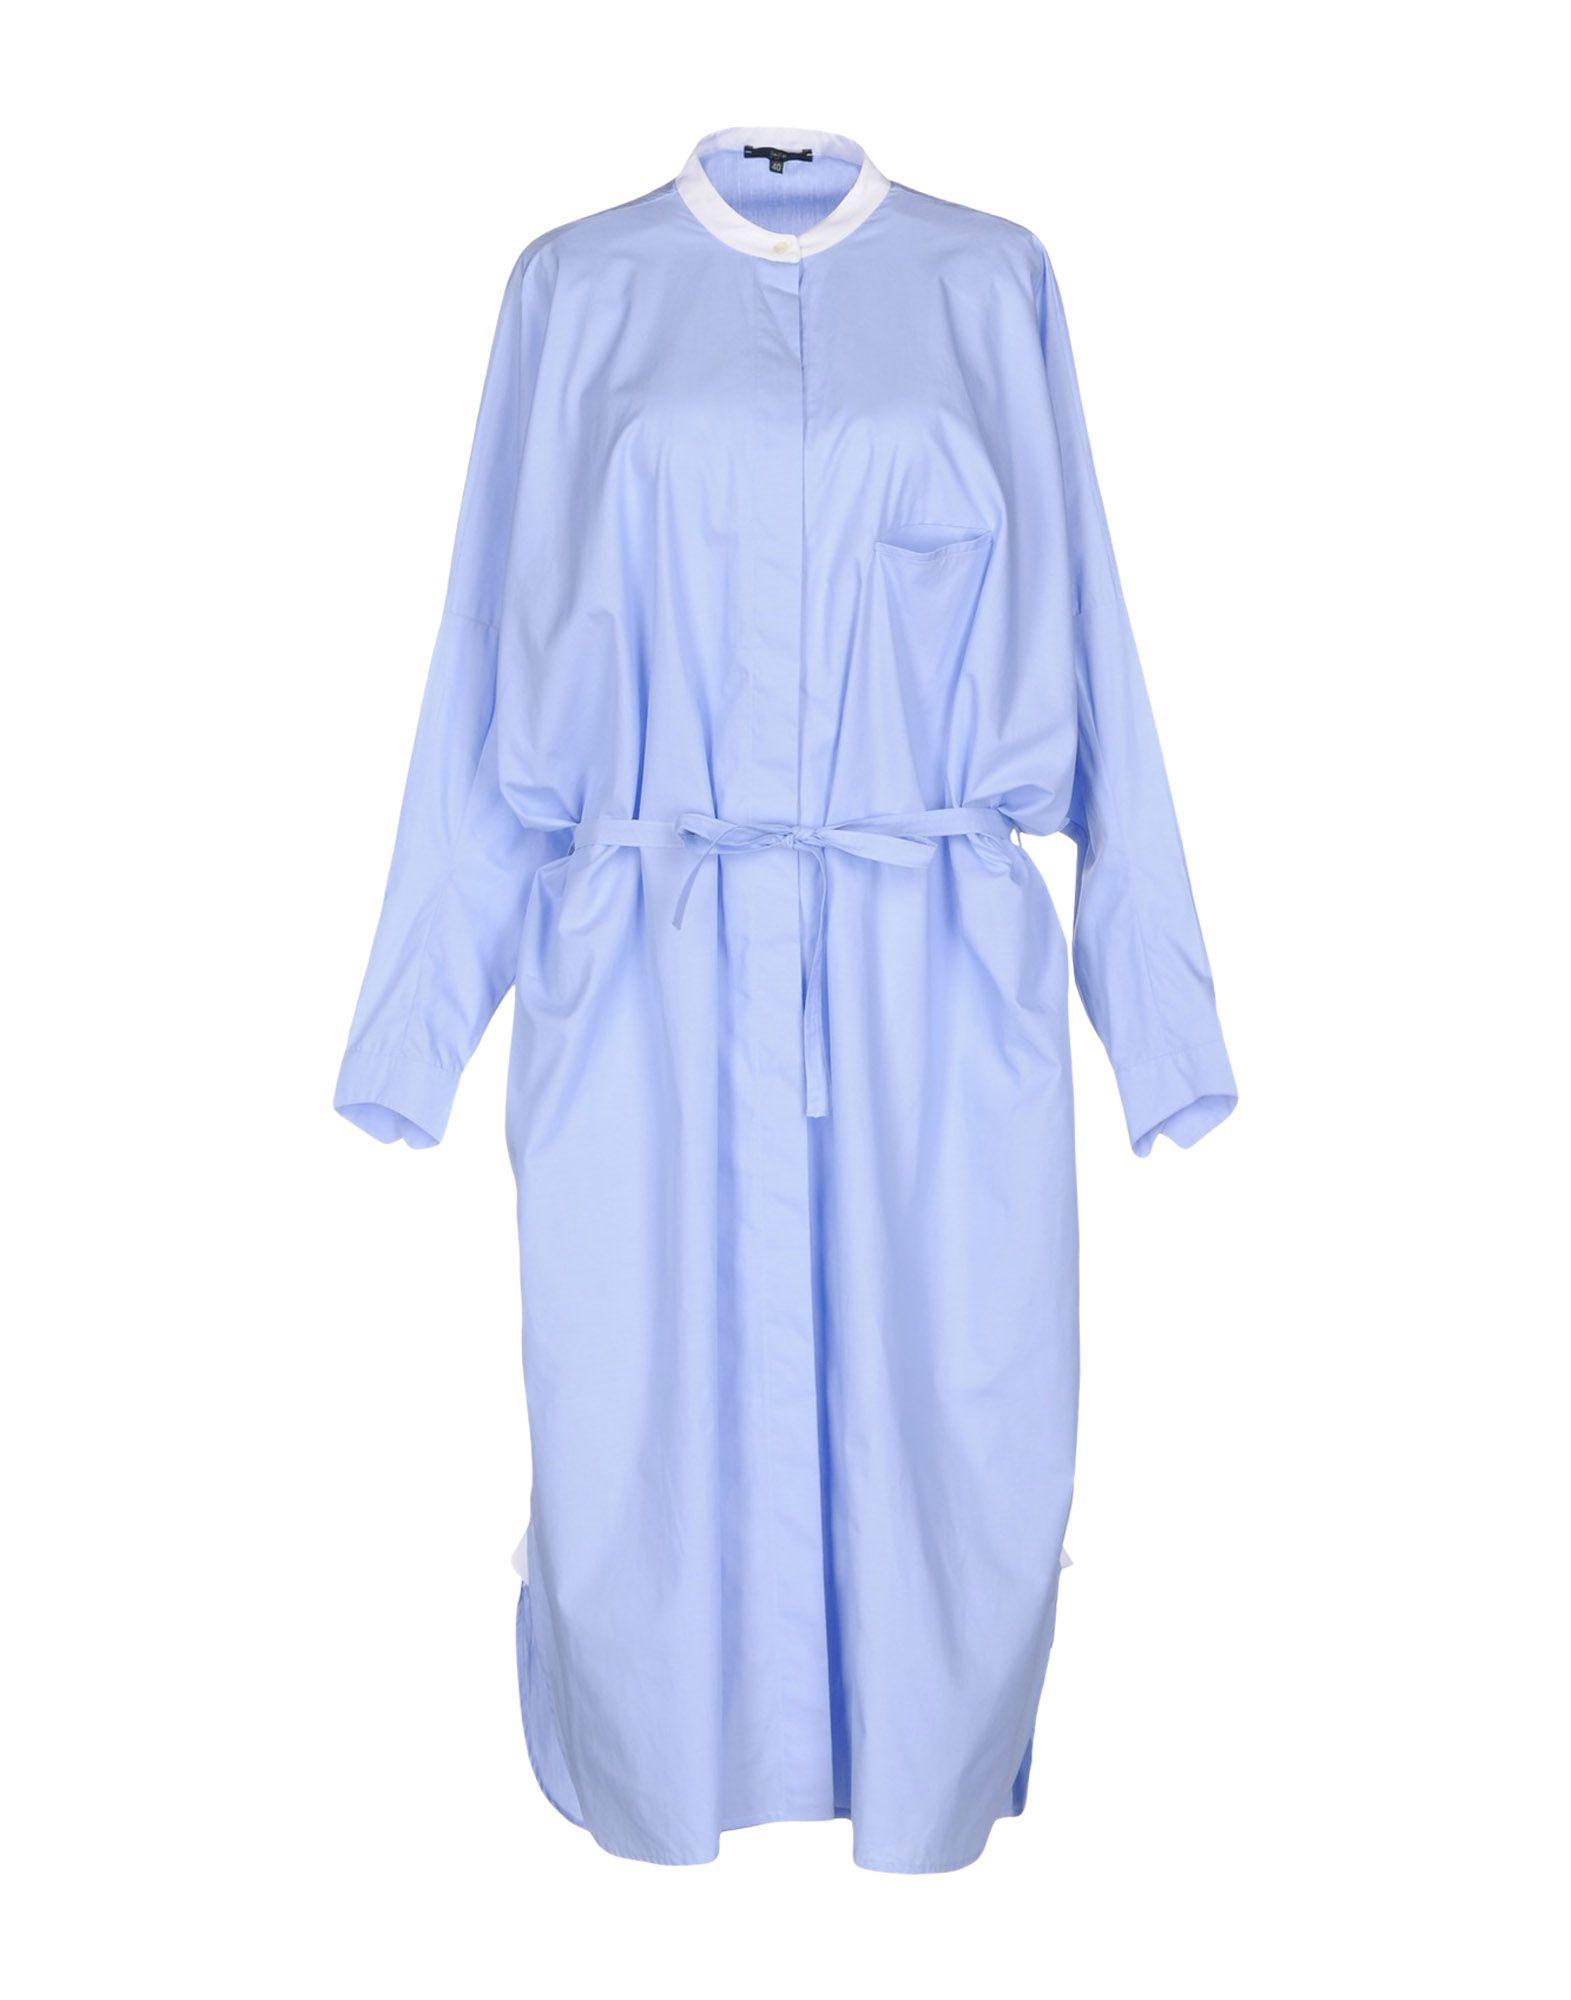 JEJIA Платье длиной 3/4 lisa corti платье длиной 3 4